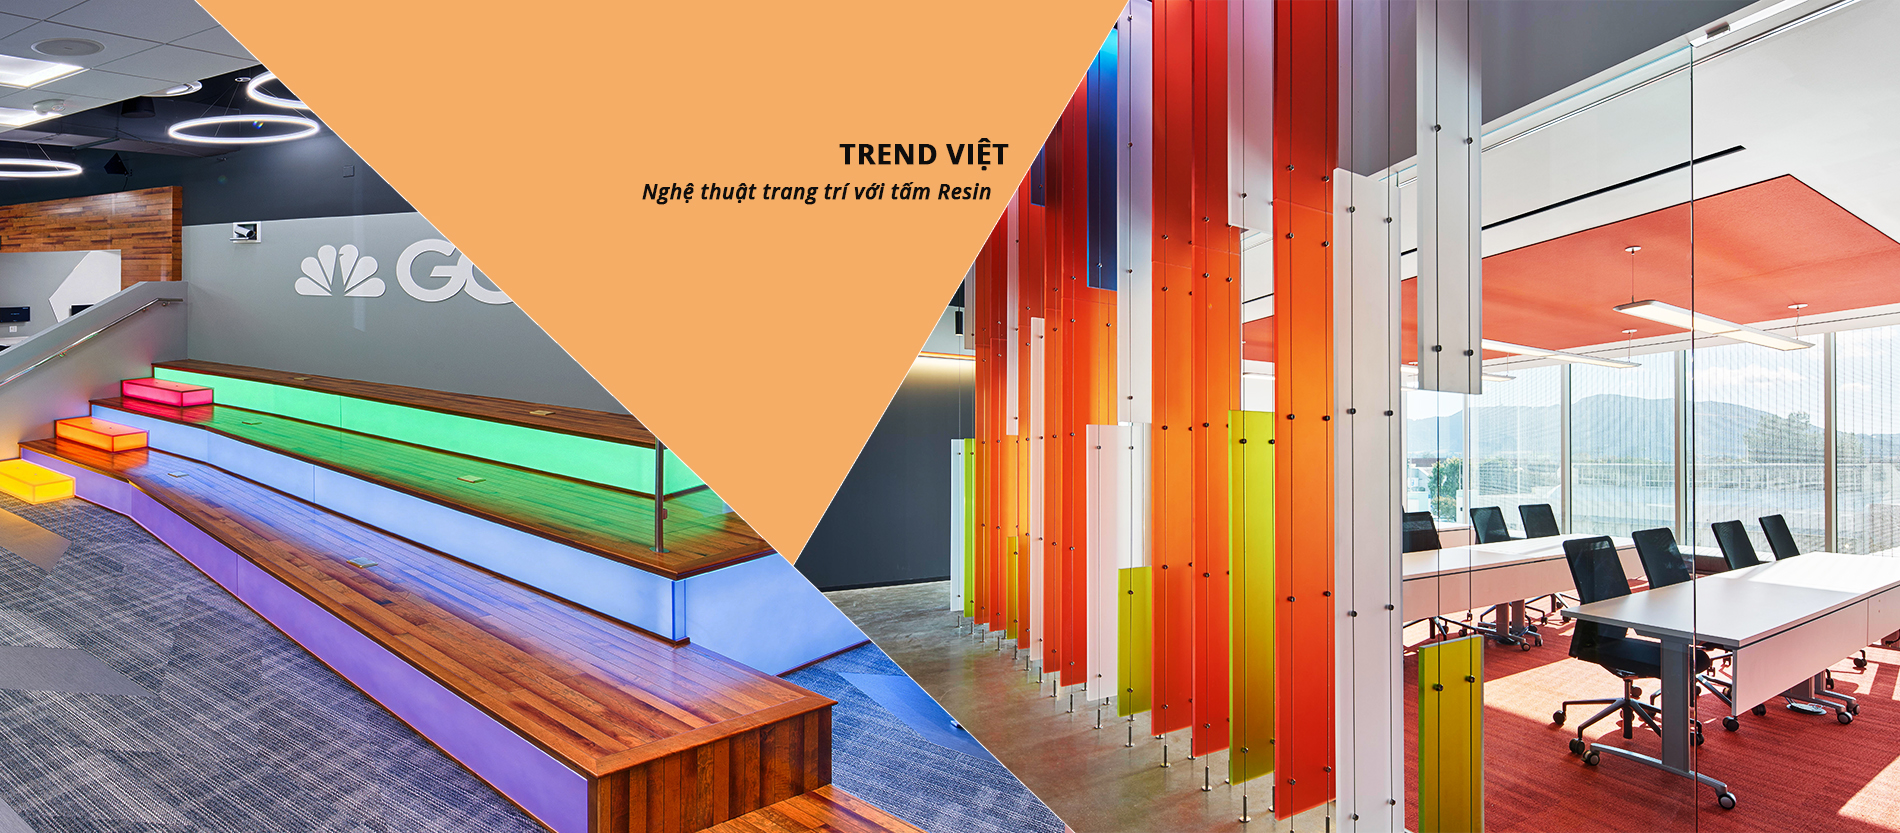 Trend Việt